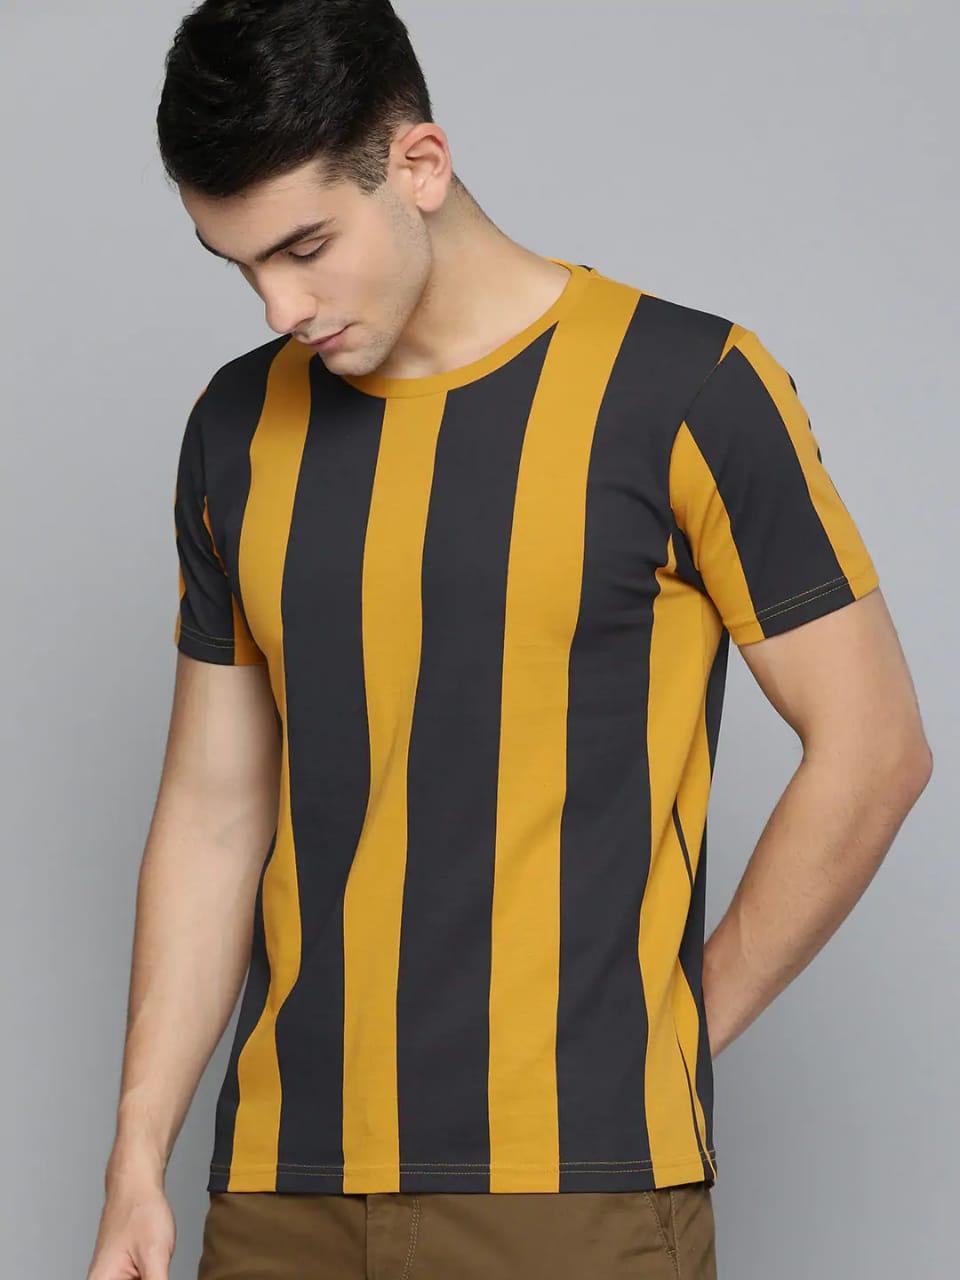 New Short Sleeve Strip Printed Summer Tshirt For Men